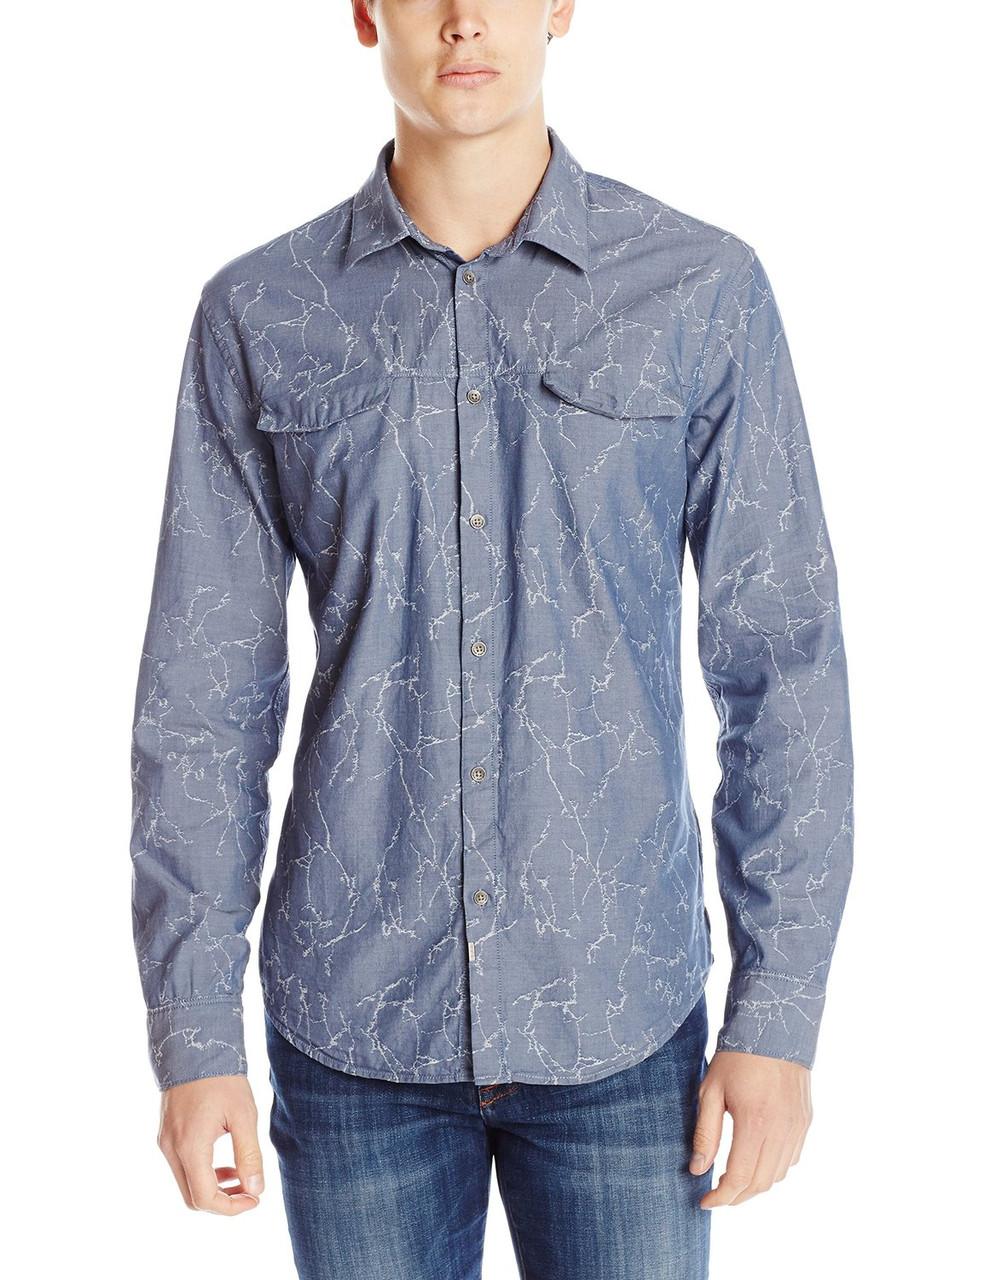 Рубашка Calvin Klein Jeans, XL, Washed Hazed, 41MW133-422